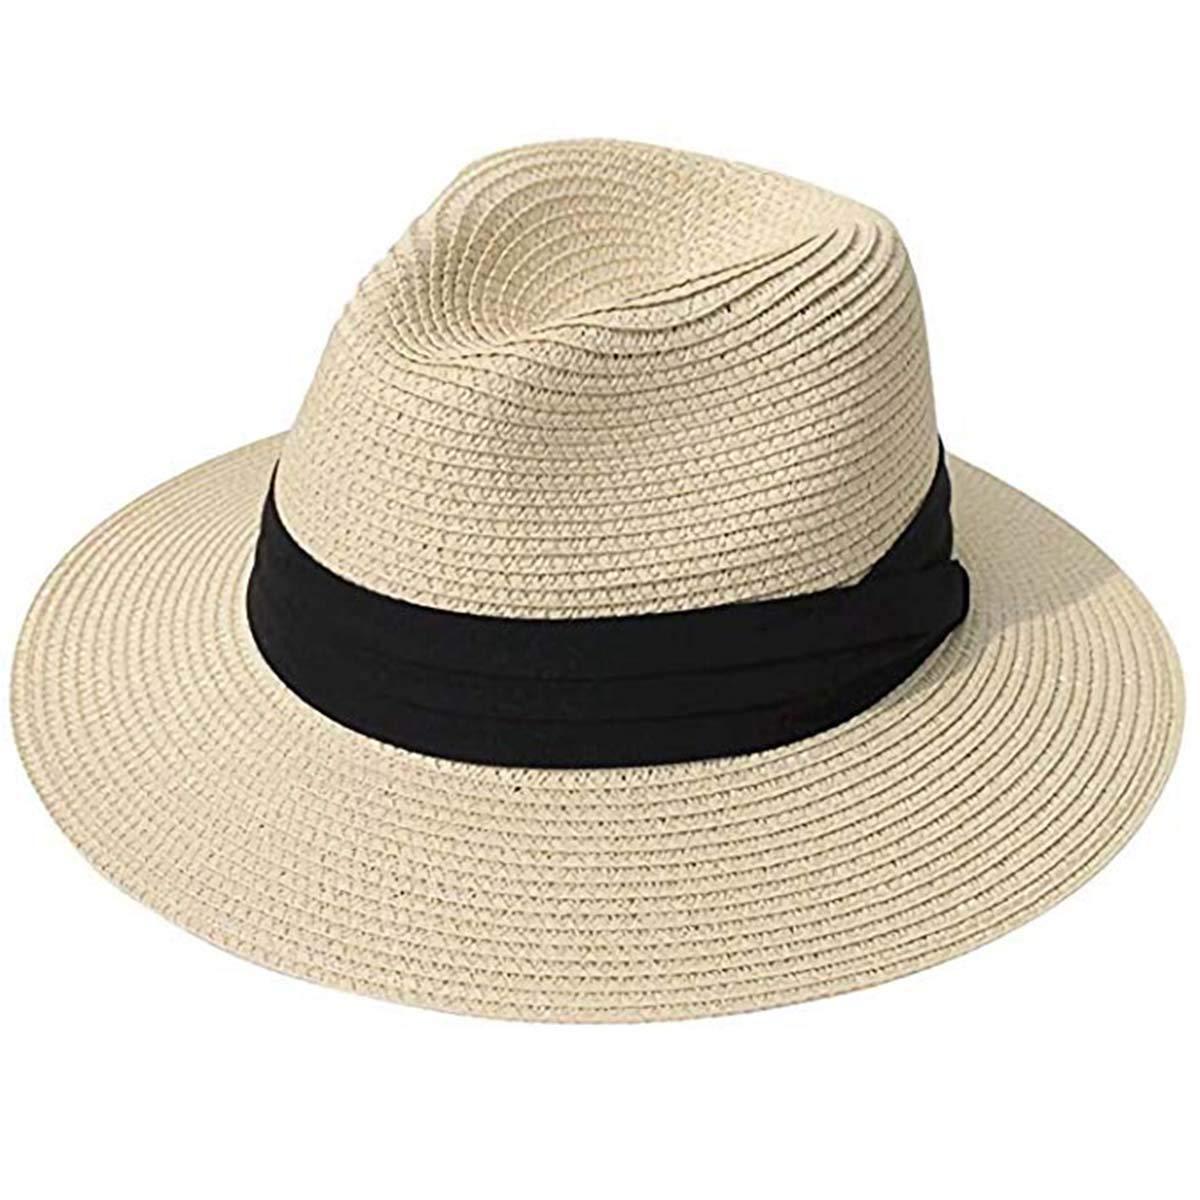 265274bfc7b Sun Hats, Women Beach Hat Fedora Panama Hat Summer Straw Cap Wide Brim  Foldable, Circumference 21 IN